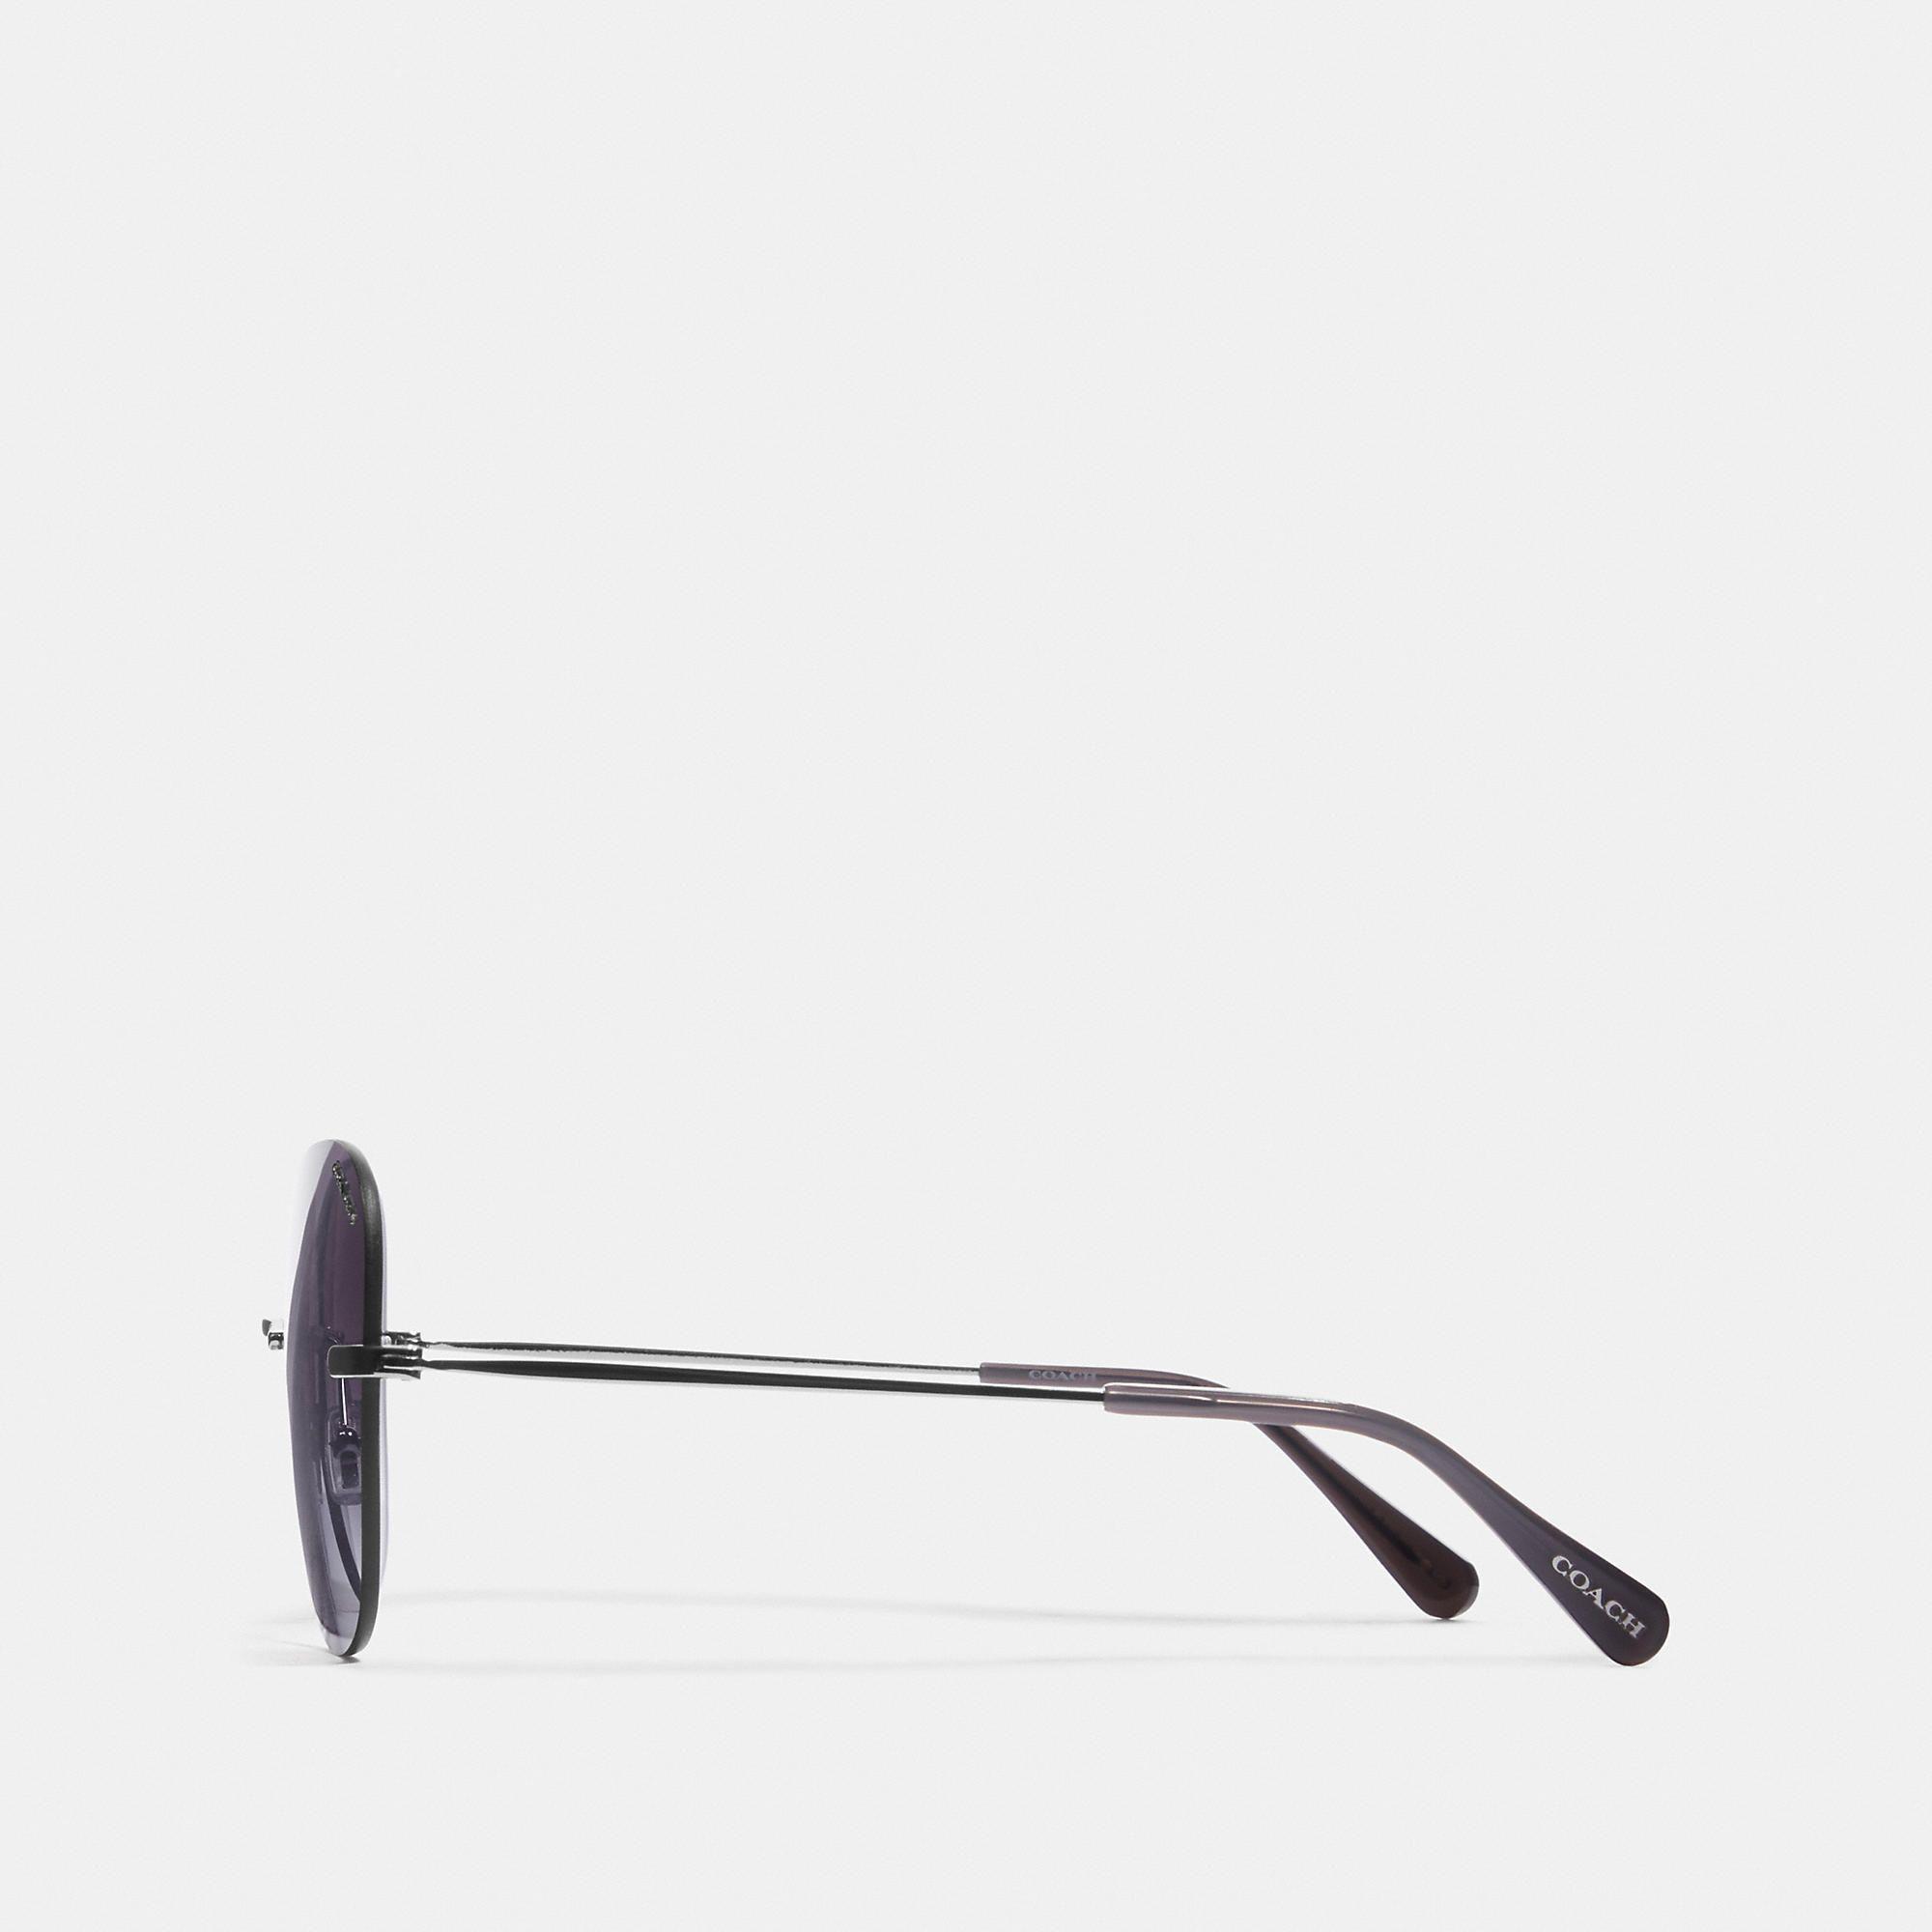 f7b7227ba6 COACH Rimless Lens Applique Sunglasses - Women's Sunwear in 2019 ...